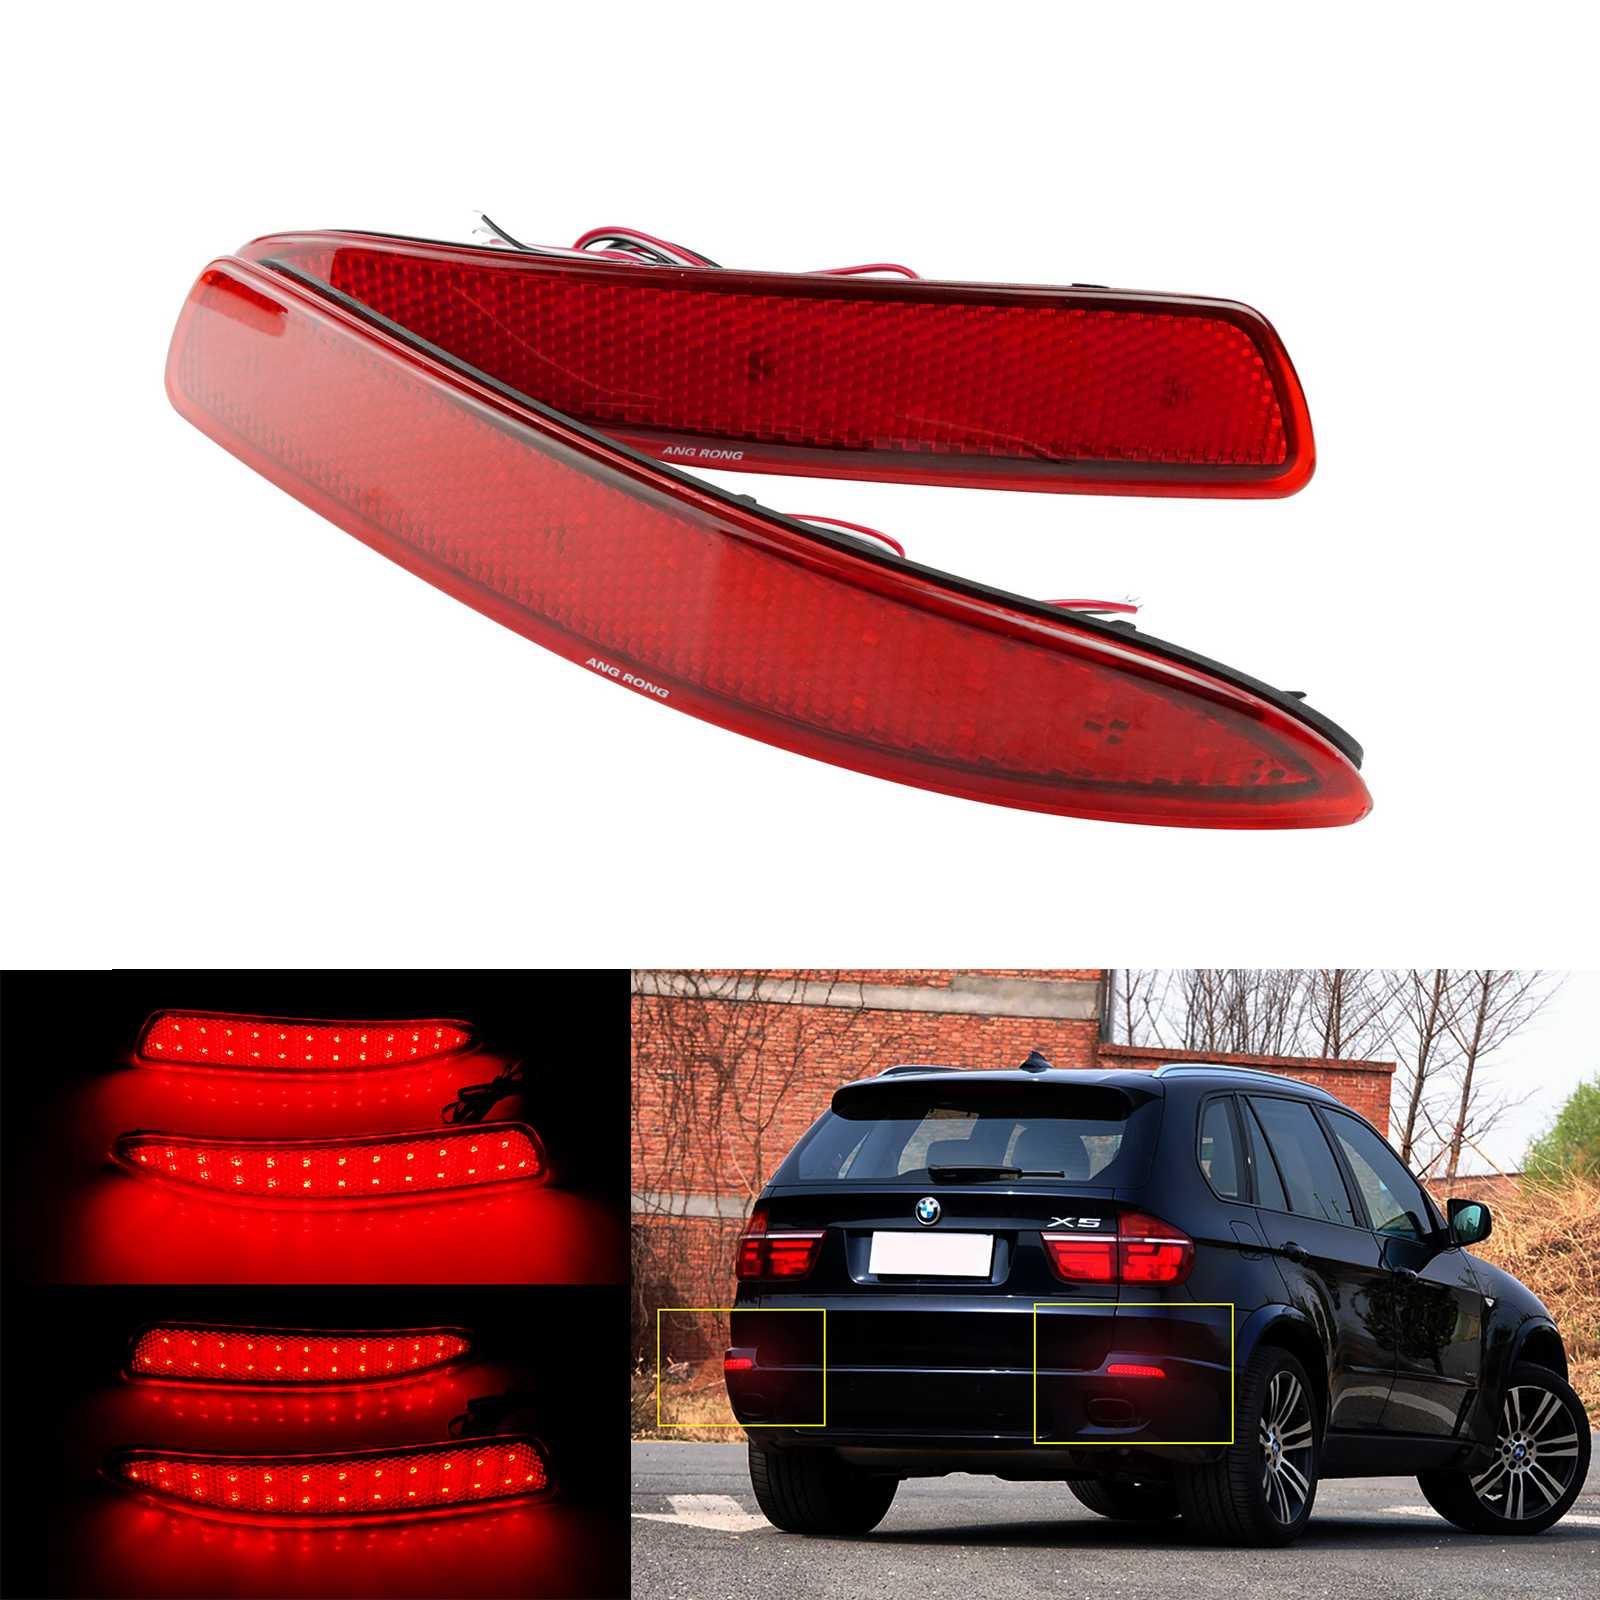 Universal 2x Red Car Auto Rear Bumper Reflective Marker Warning sticker Decal